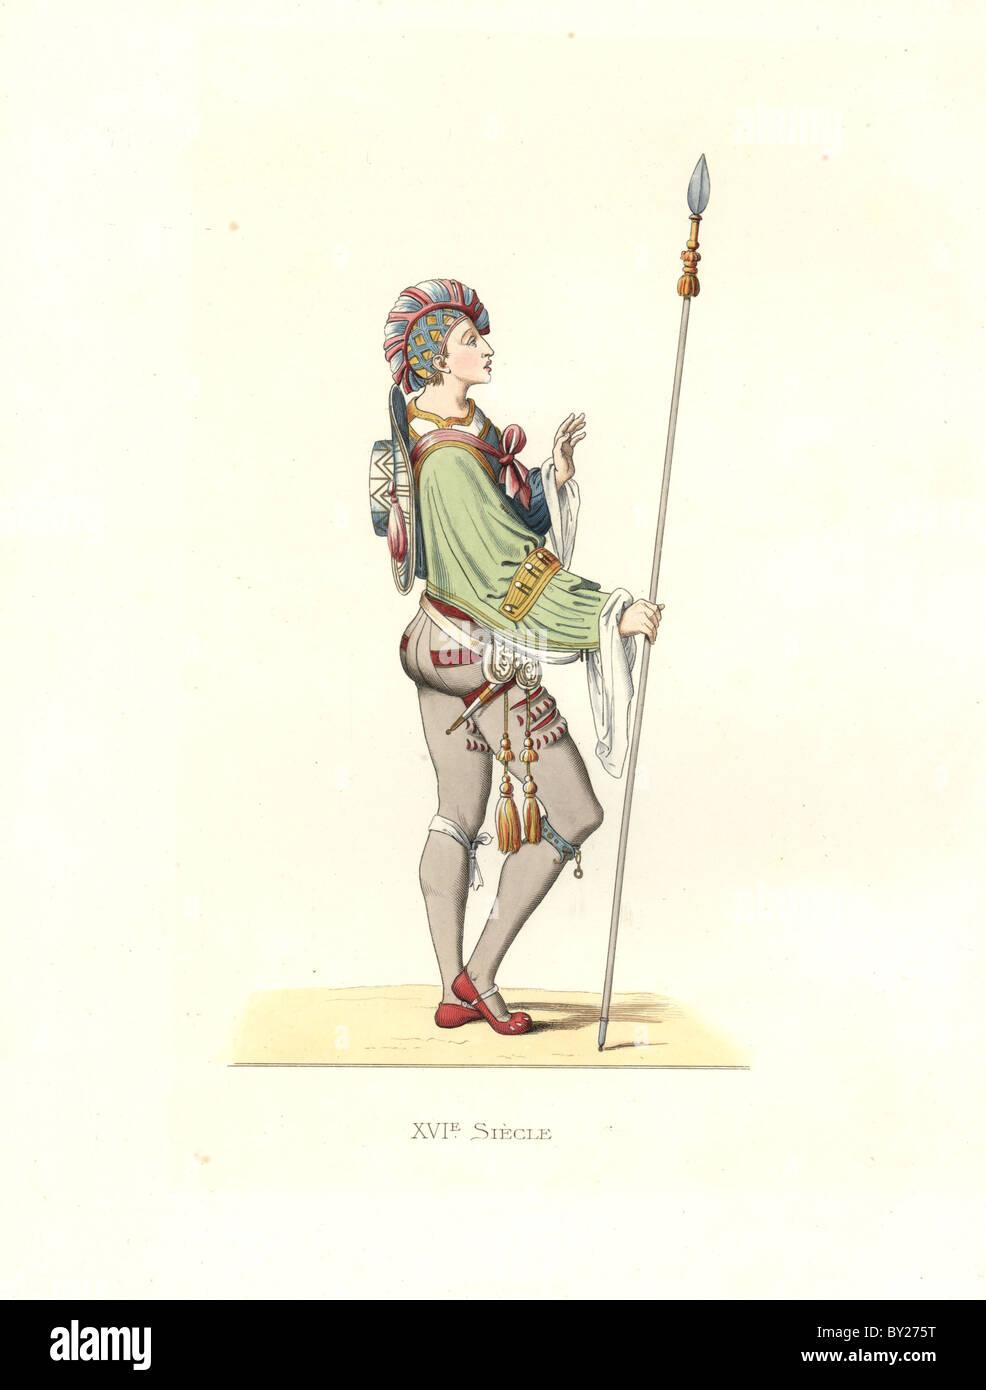 Flemish military attendant, 16th century. - Stock Image